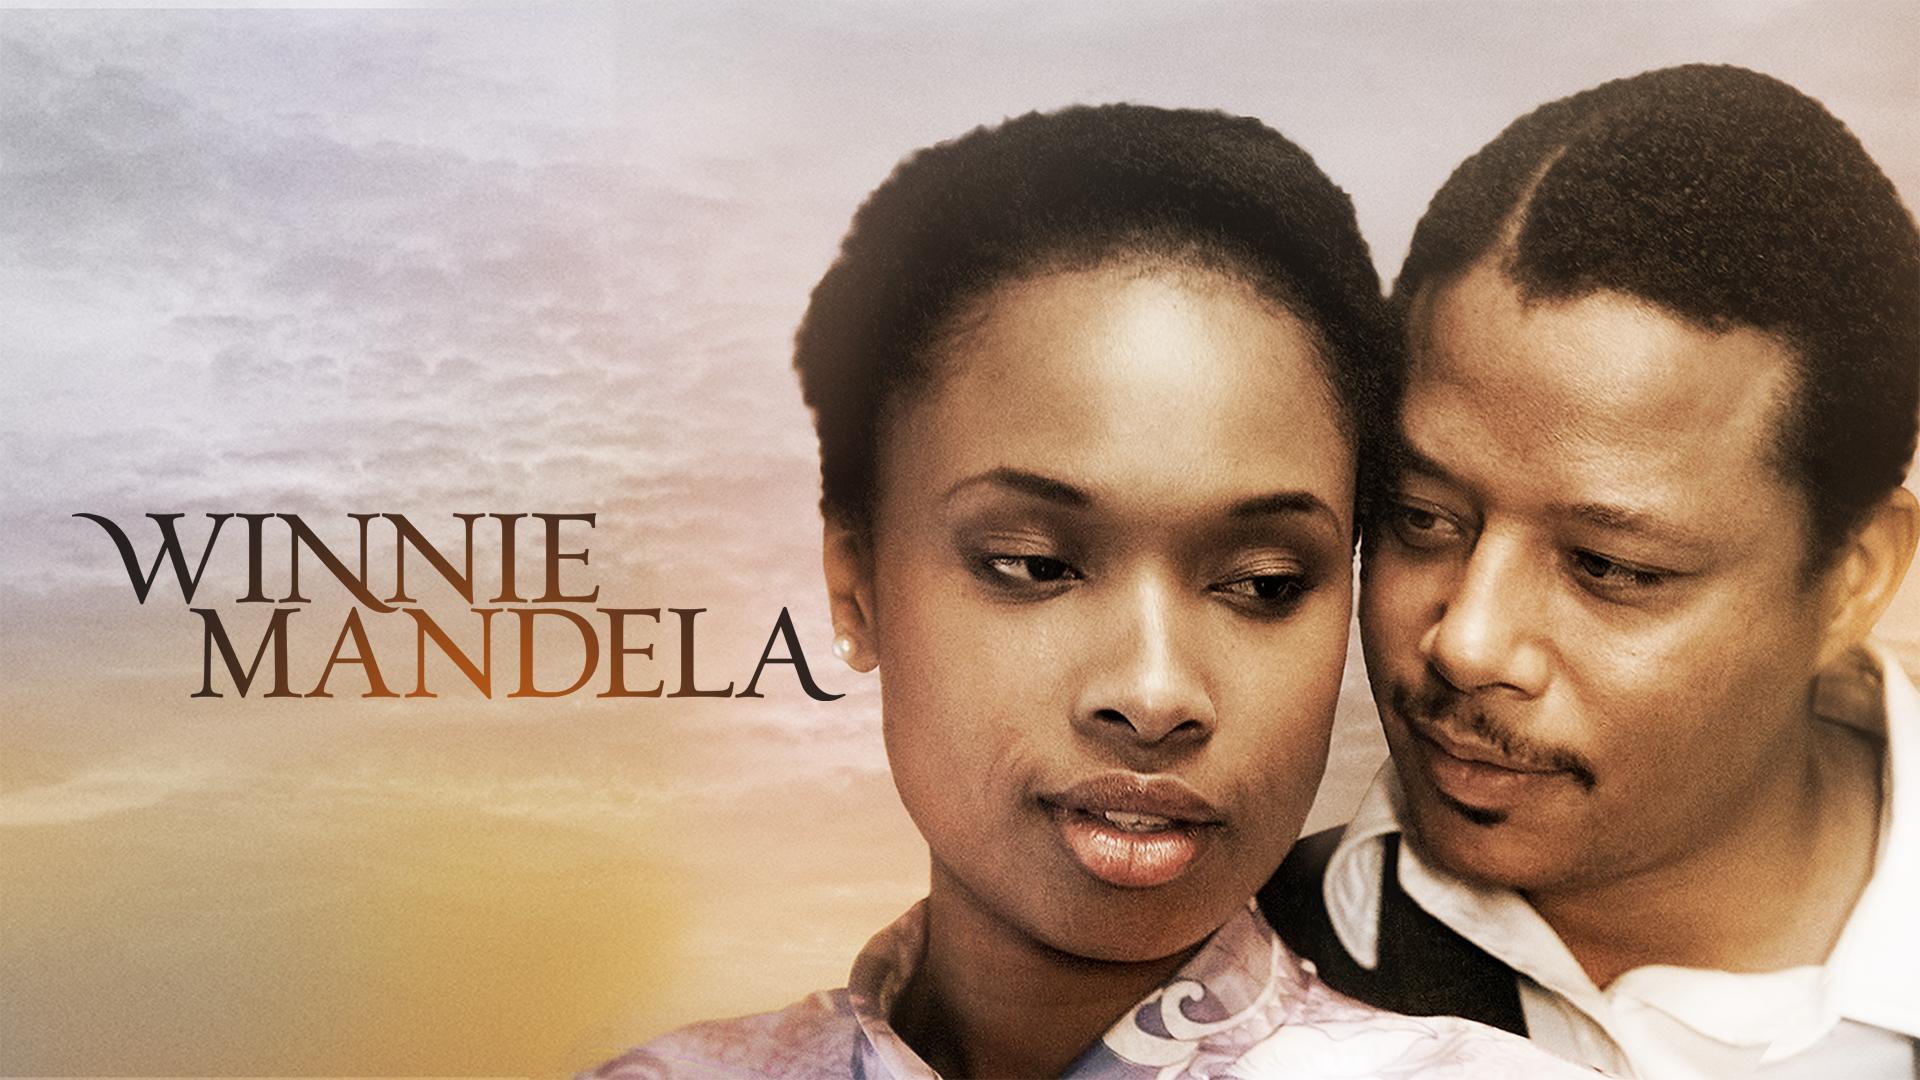 Winnie Mandela - Celebrate Women's Stories category image